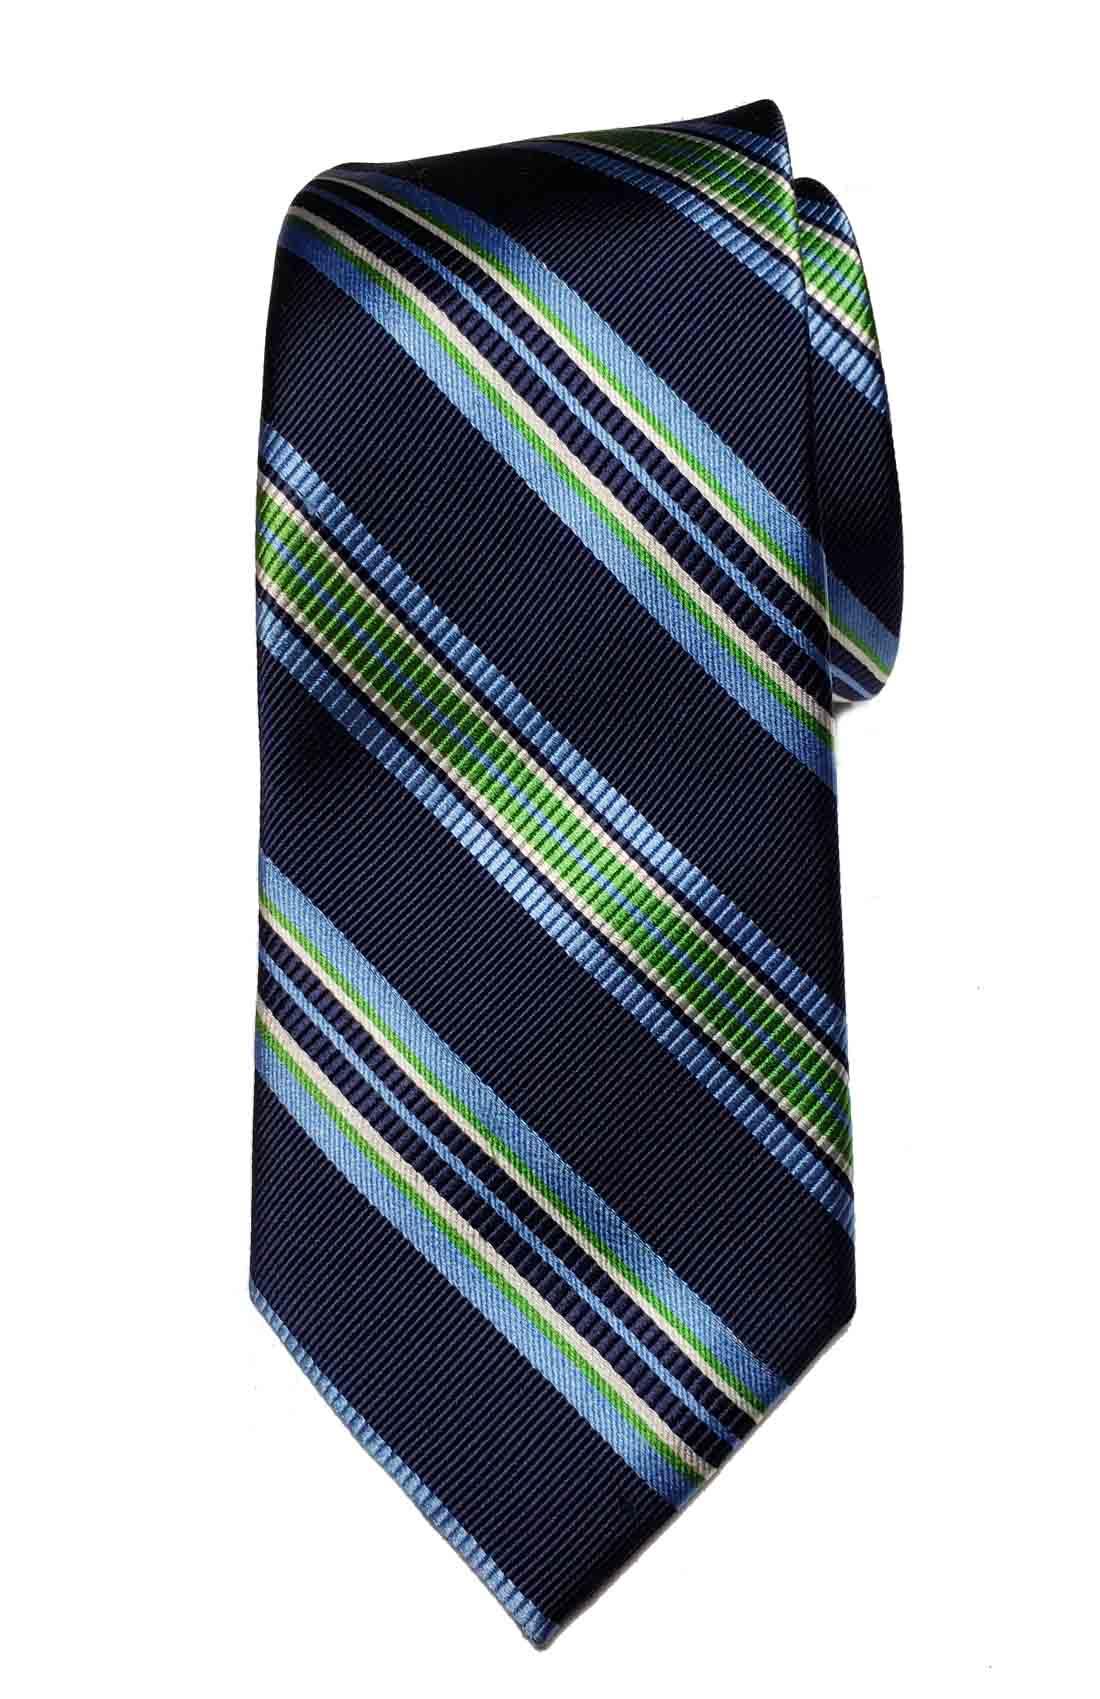 Jos A Bank Silk Tie Striped Navy Blue Green White Men's